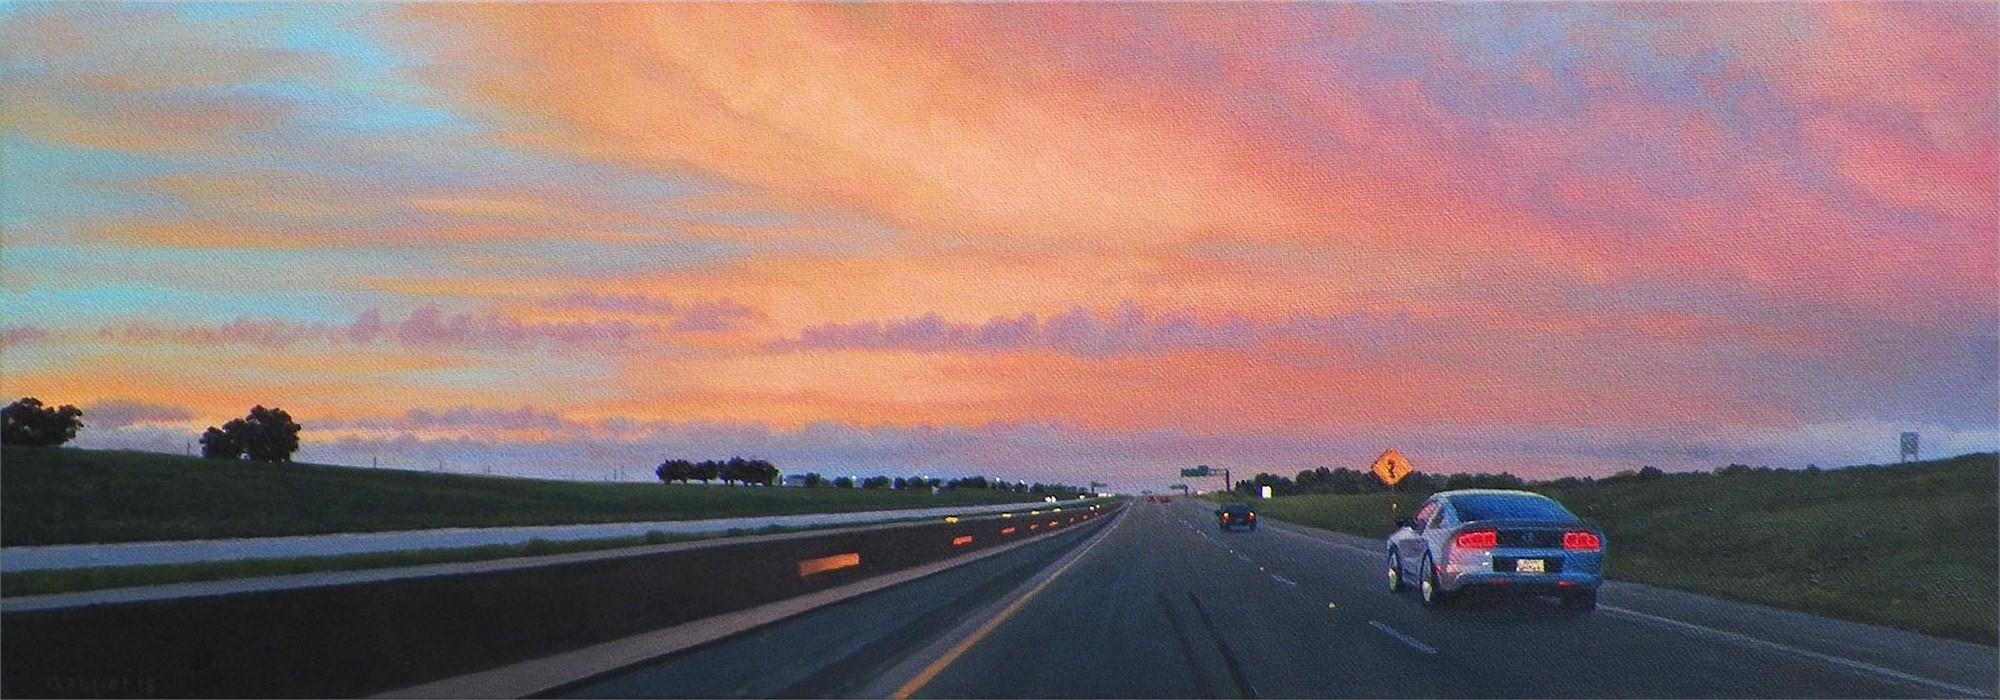 Texas Highway I-35N by Pat Gabriel